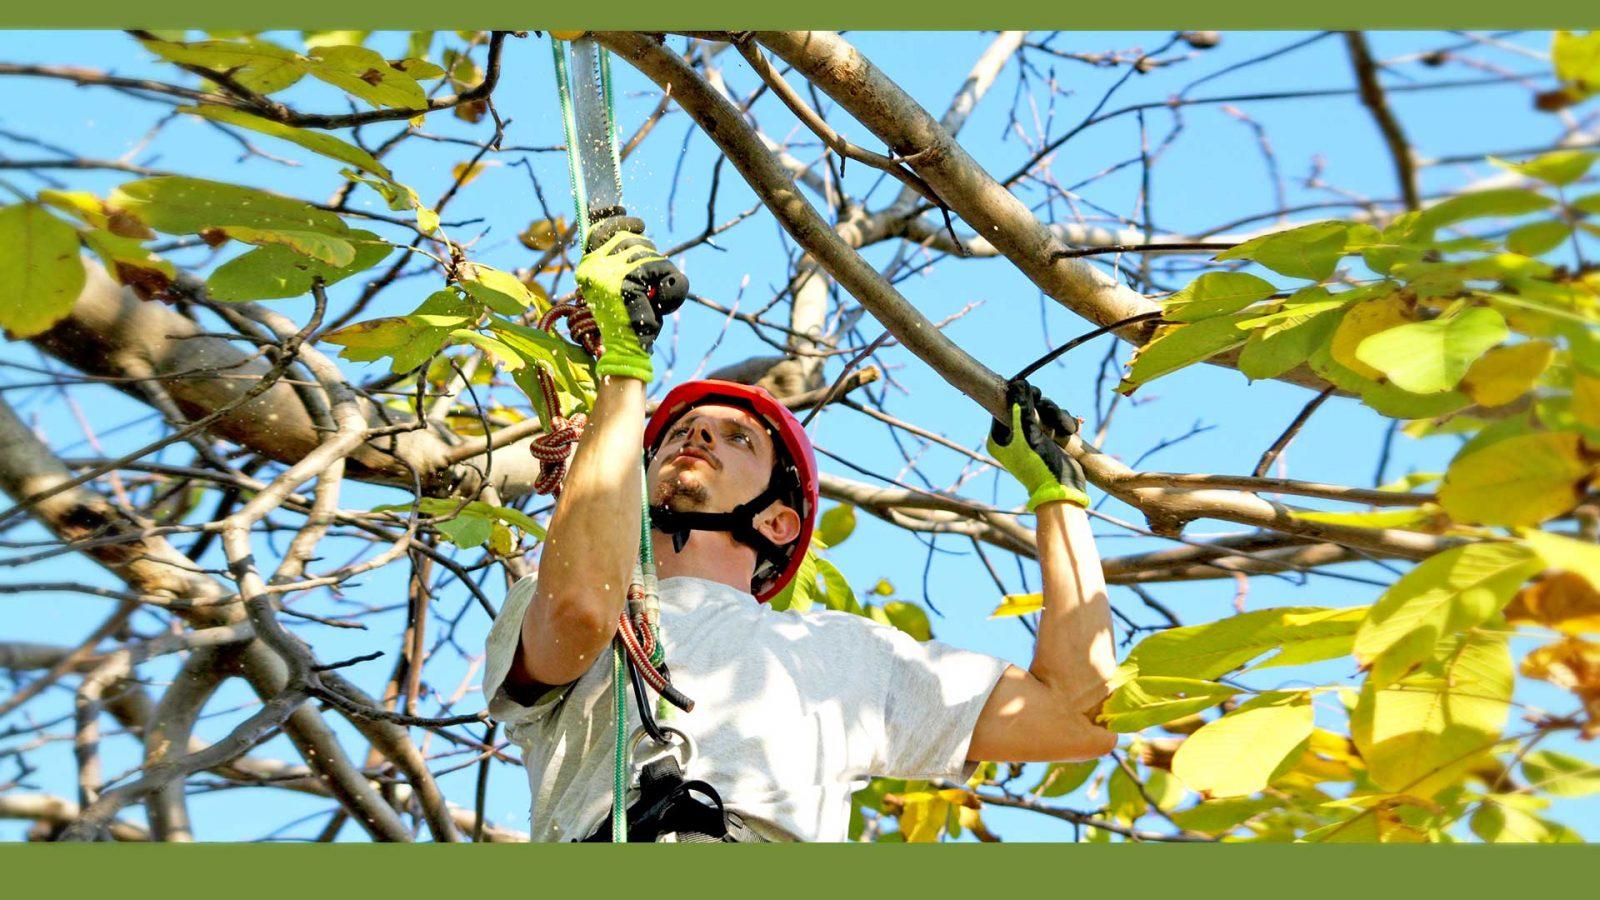 tree climber professionista